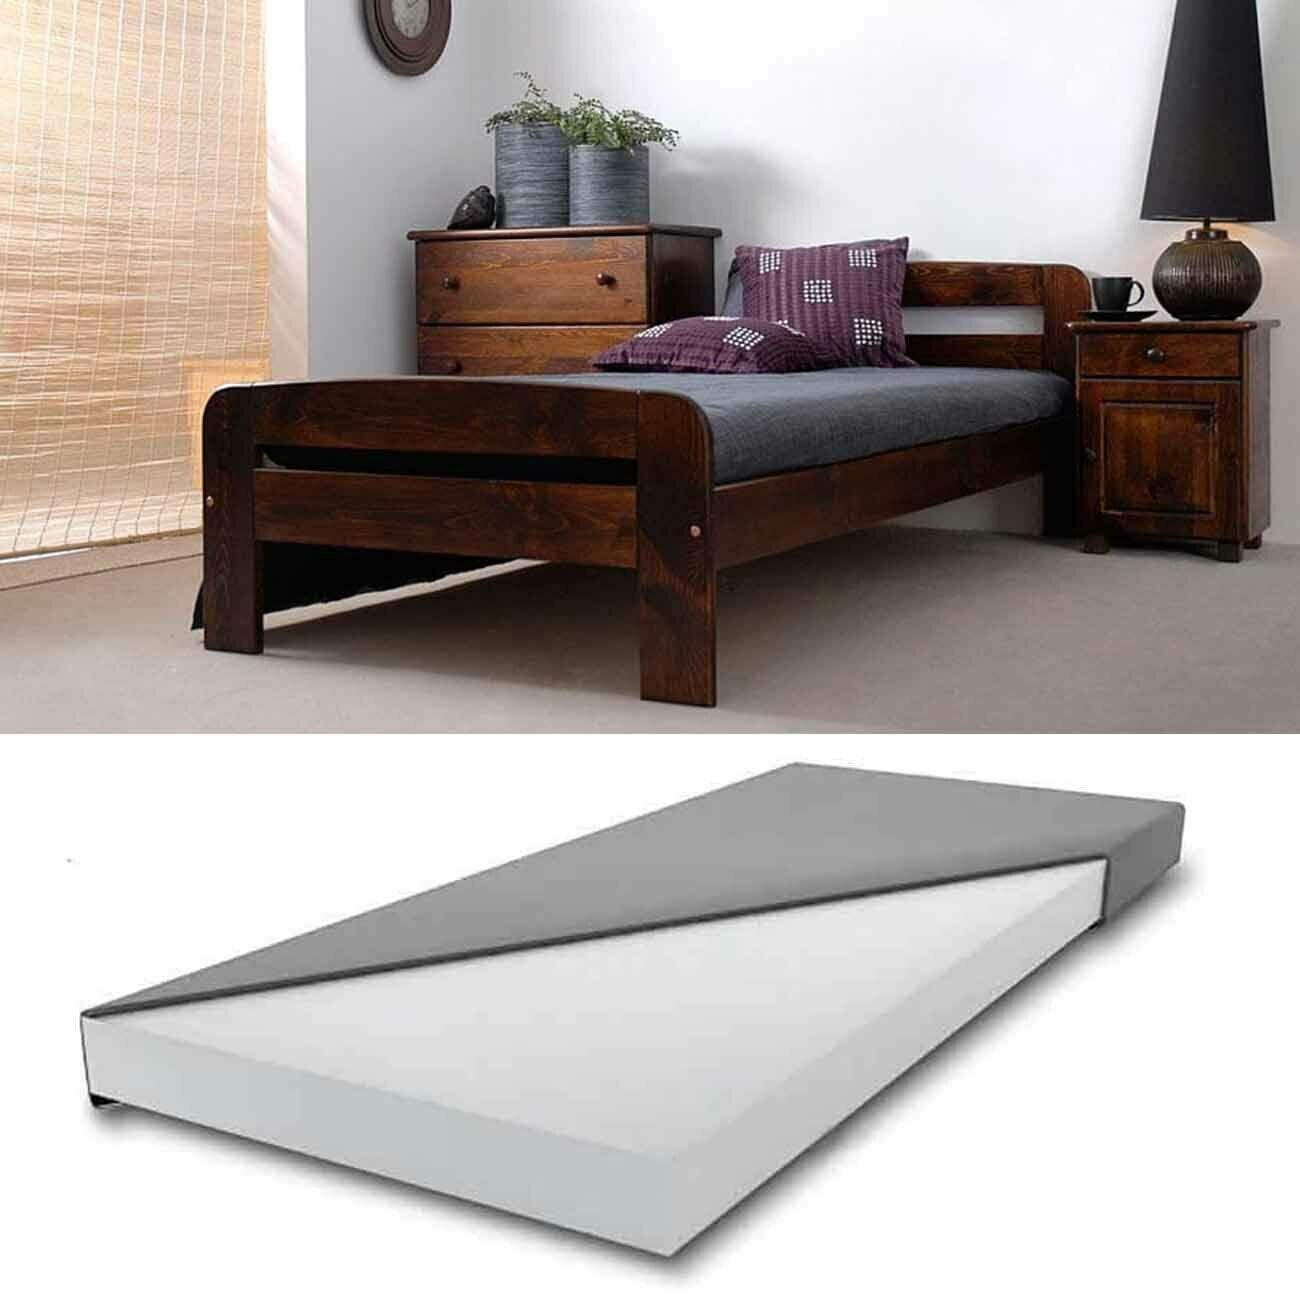 Bett Mit Matratze In 2020 Bett Mit Lattenrost Holzbetten Bett Matratze